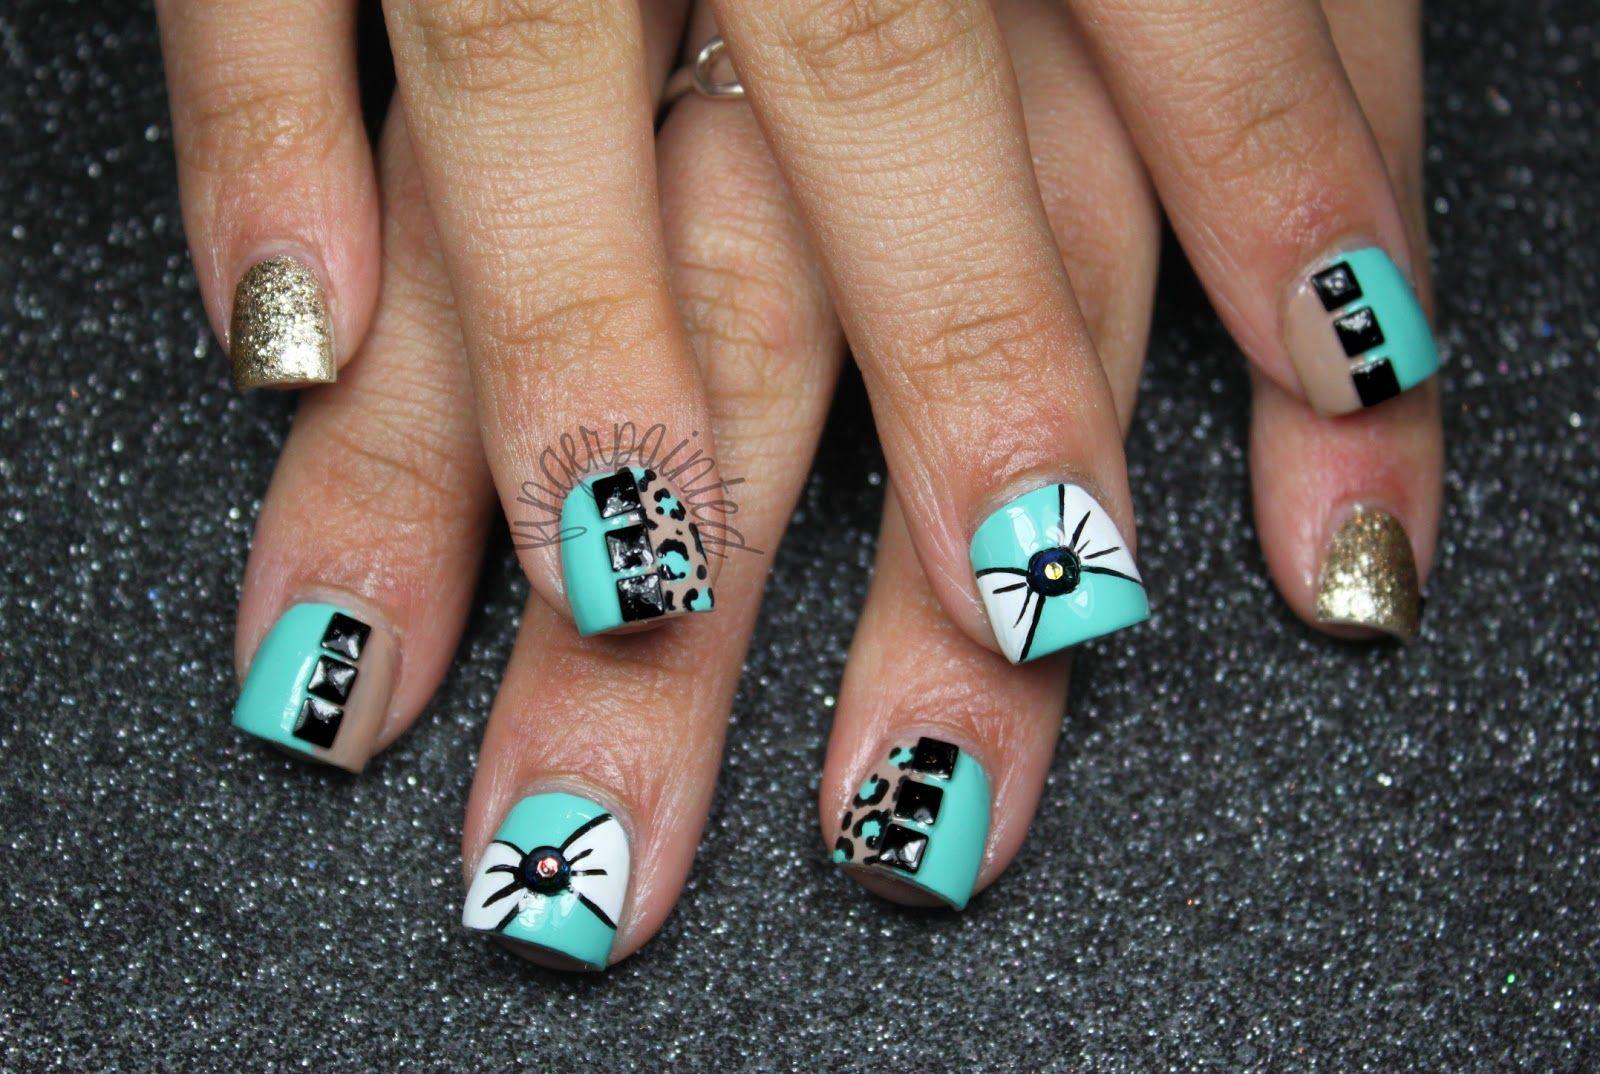 acrylic nail designs for teens stiletto | Art Design Gallery ...